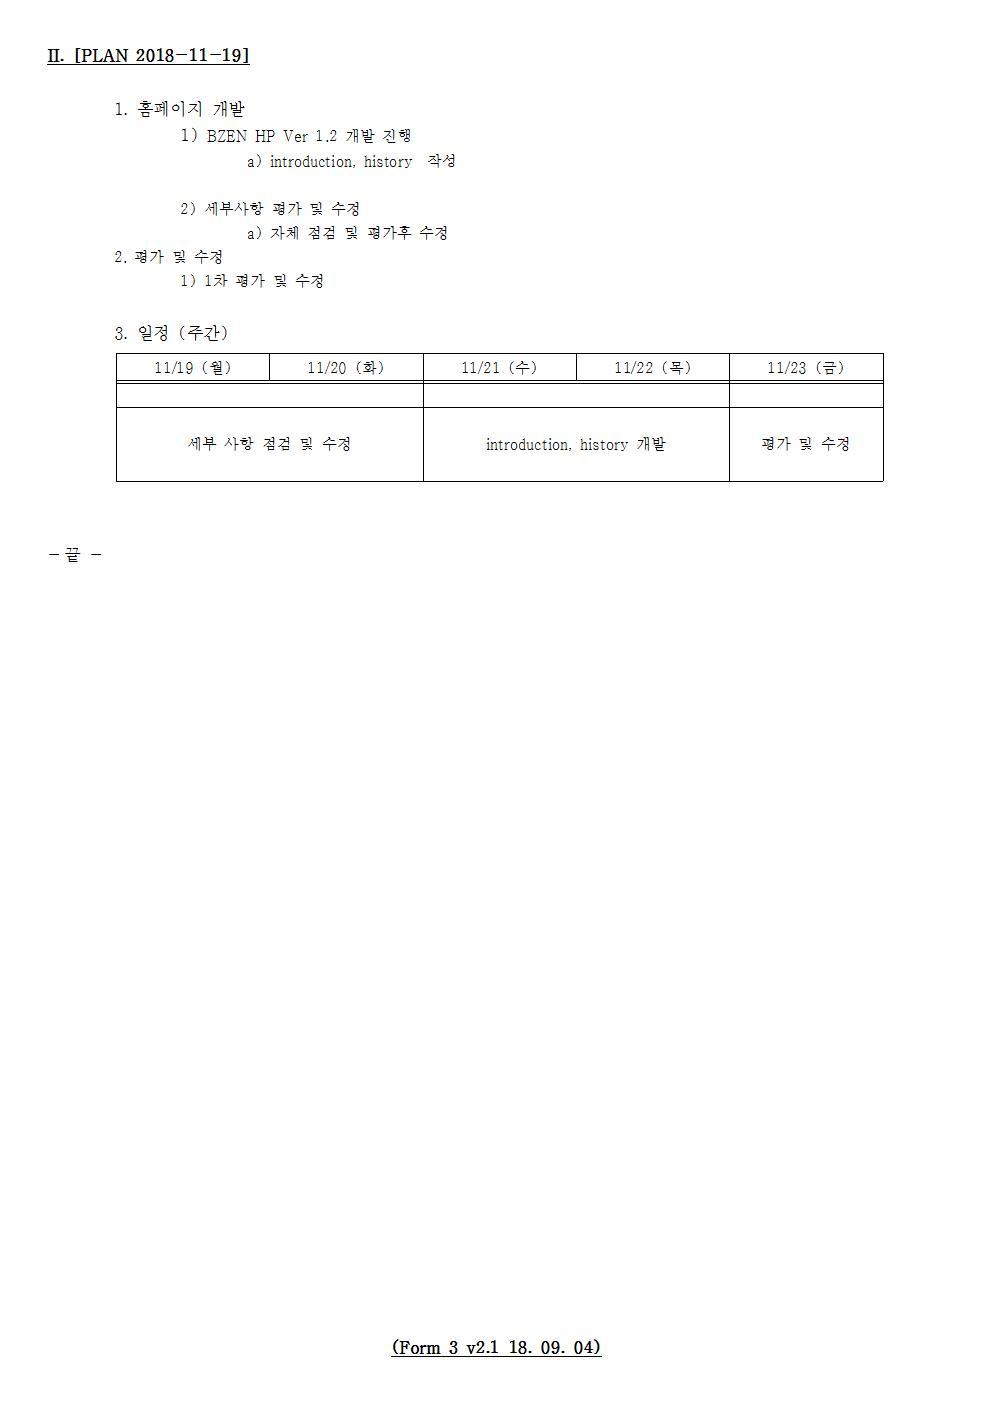 D-[18-047-BZ-07]-[BZEN HP v3.0]-[2018-11-19][HH]002.jpg